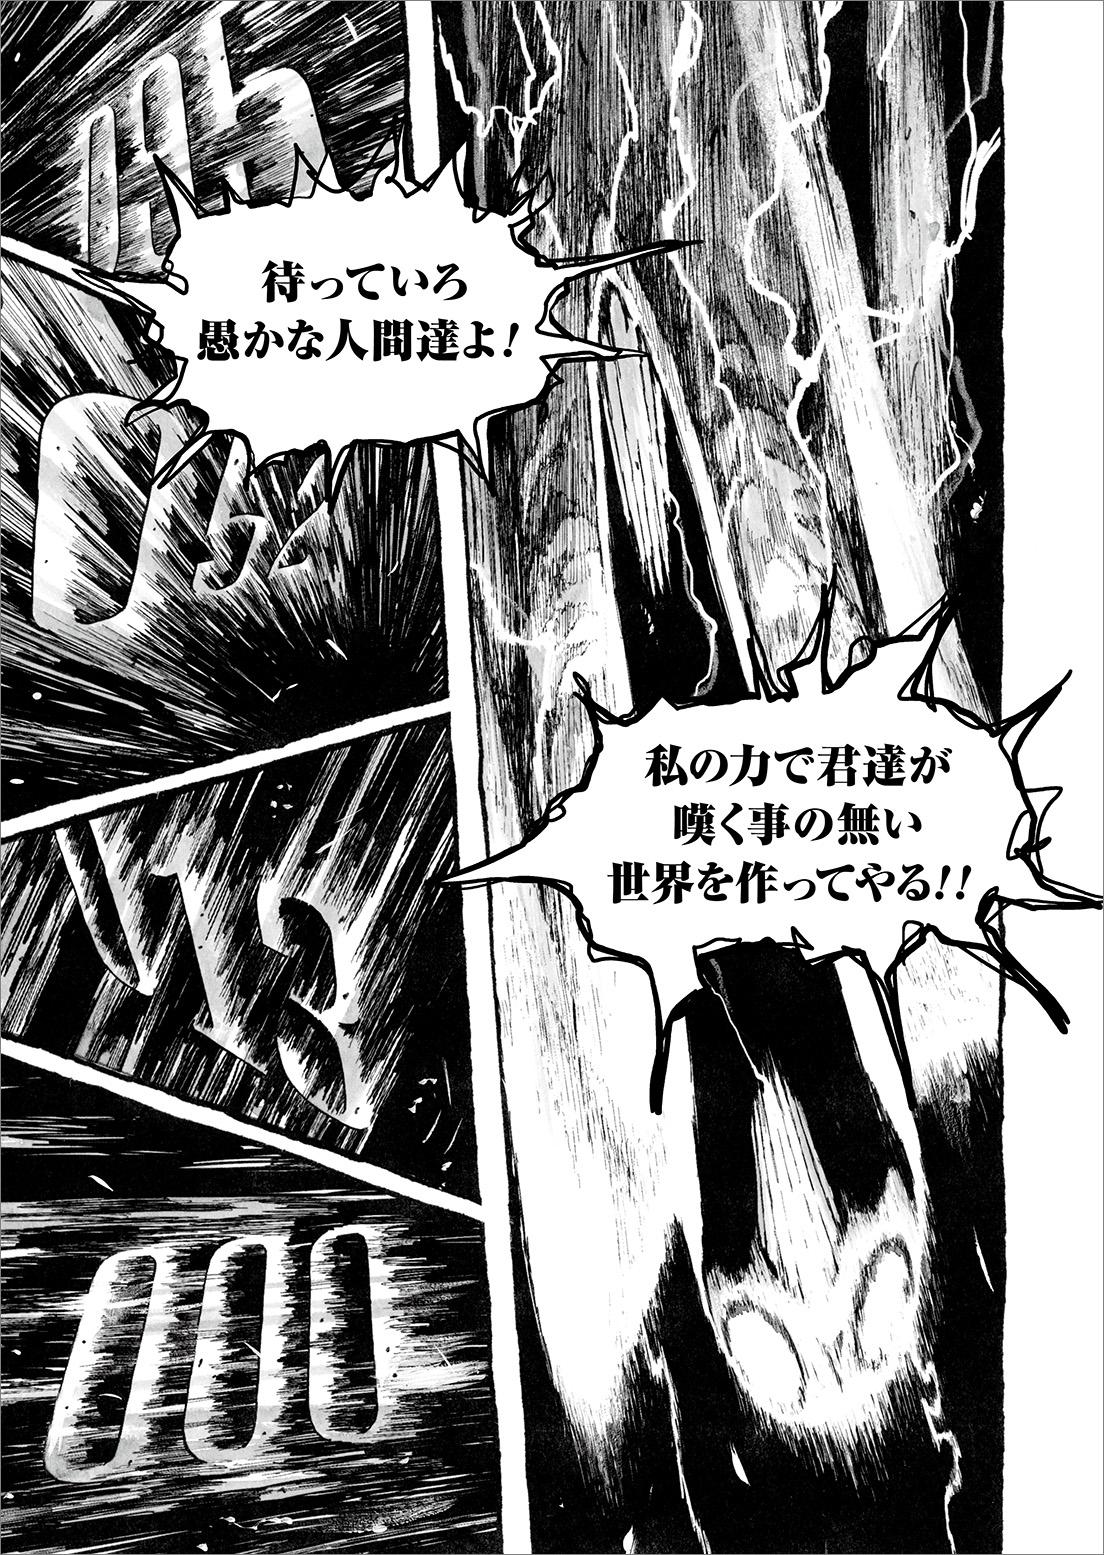 長編漫画「BIBLIOMANIA」第9話「宴」15P